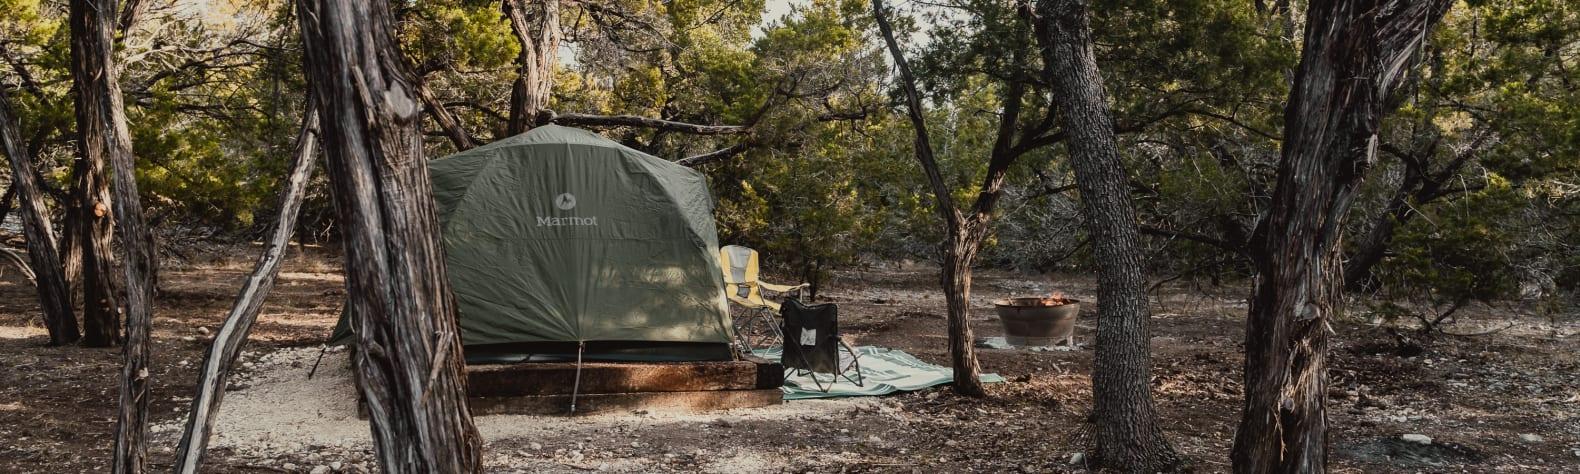 Seco Ridge Campgrounds